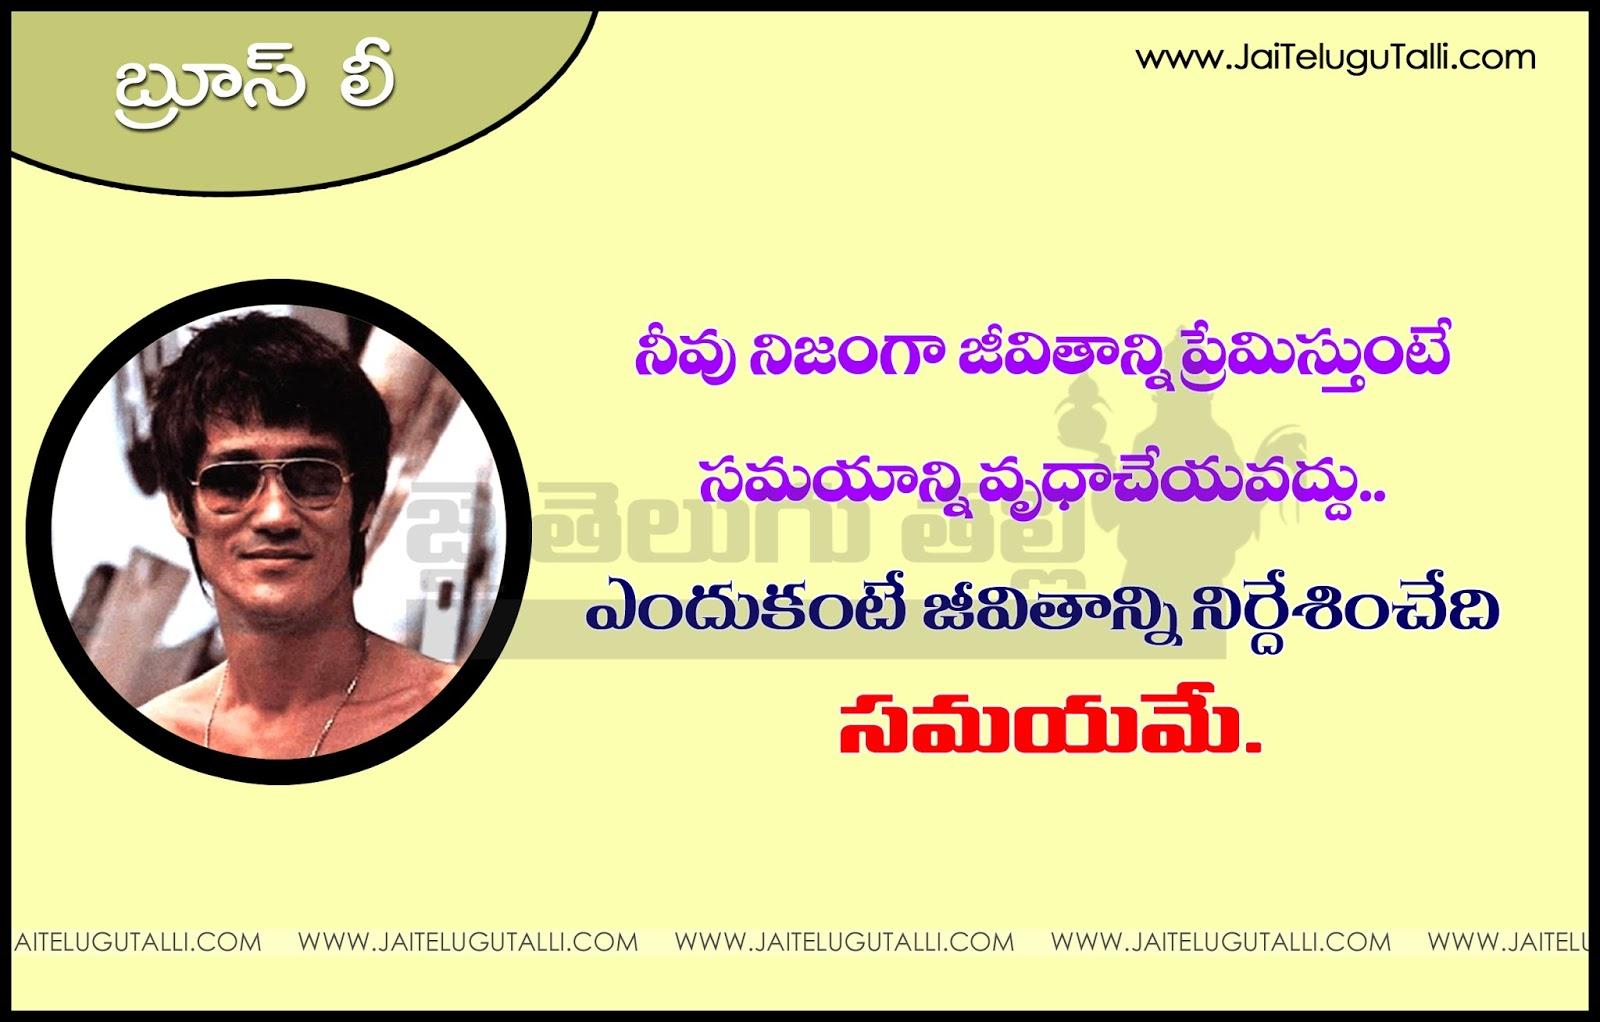 Best Telugu Inspirational Quotes   Best Bruce Lee Telugu Quotes    Inspirational Life Quotes In Telugu